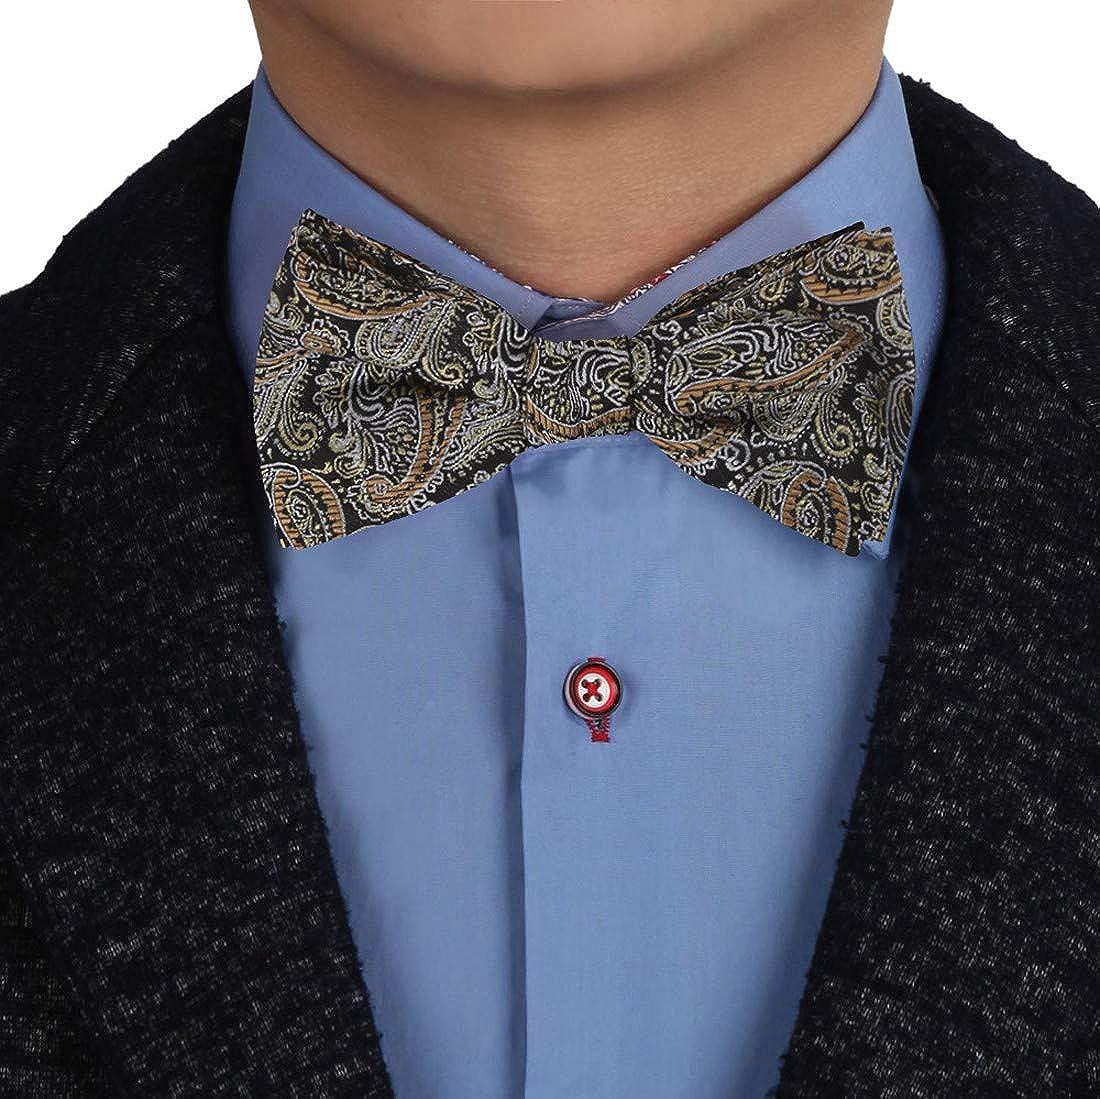 Epoint Men's Fashion Multicolored Fashion Patterned Silk Self Bowtie Set